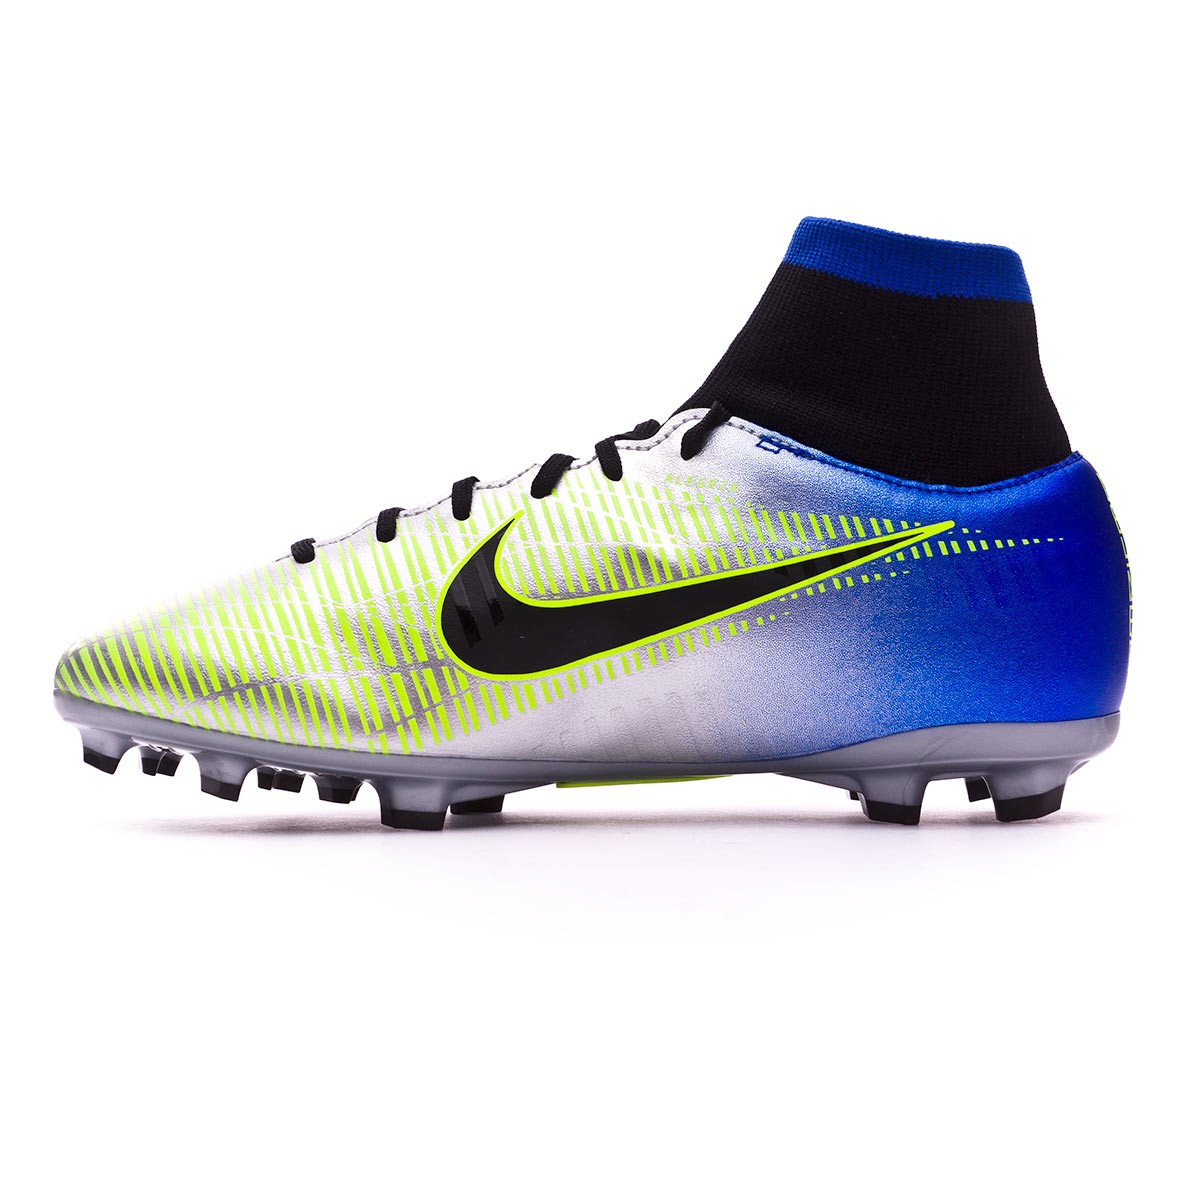 Zapatos de fútbol Nike Mercurial Victory VI DF FG Neymar Niño Racer  blue-Black-Chrome-Volt - Soloporteros es ahora Fútbol Emotion 540db5c0b8f35